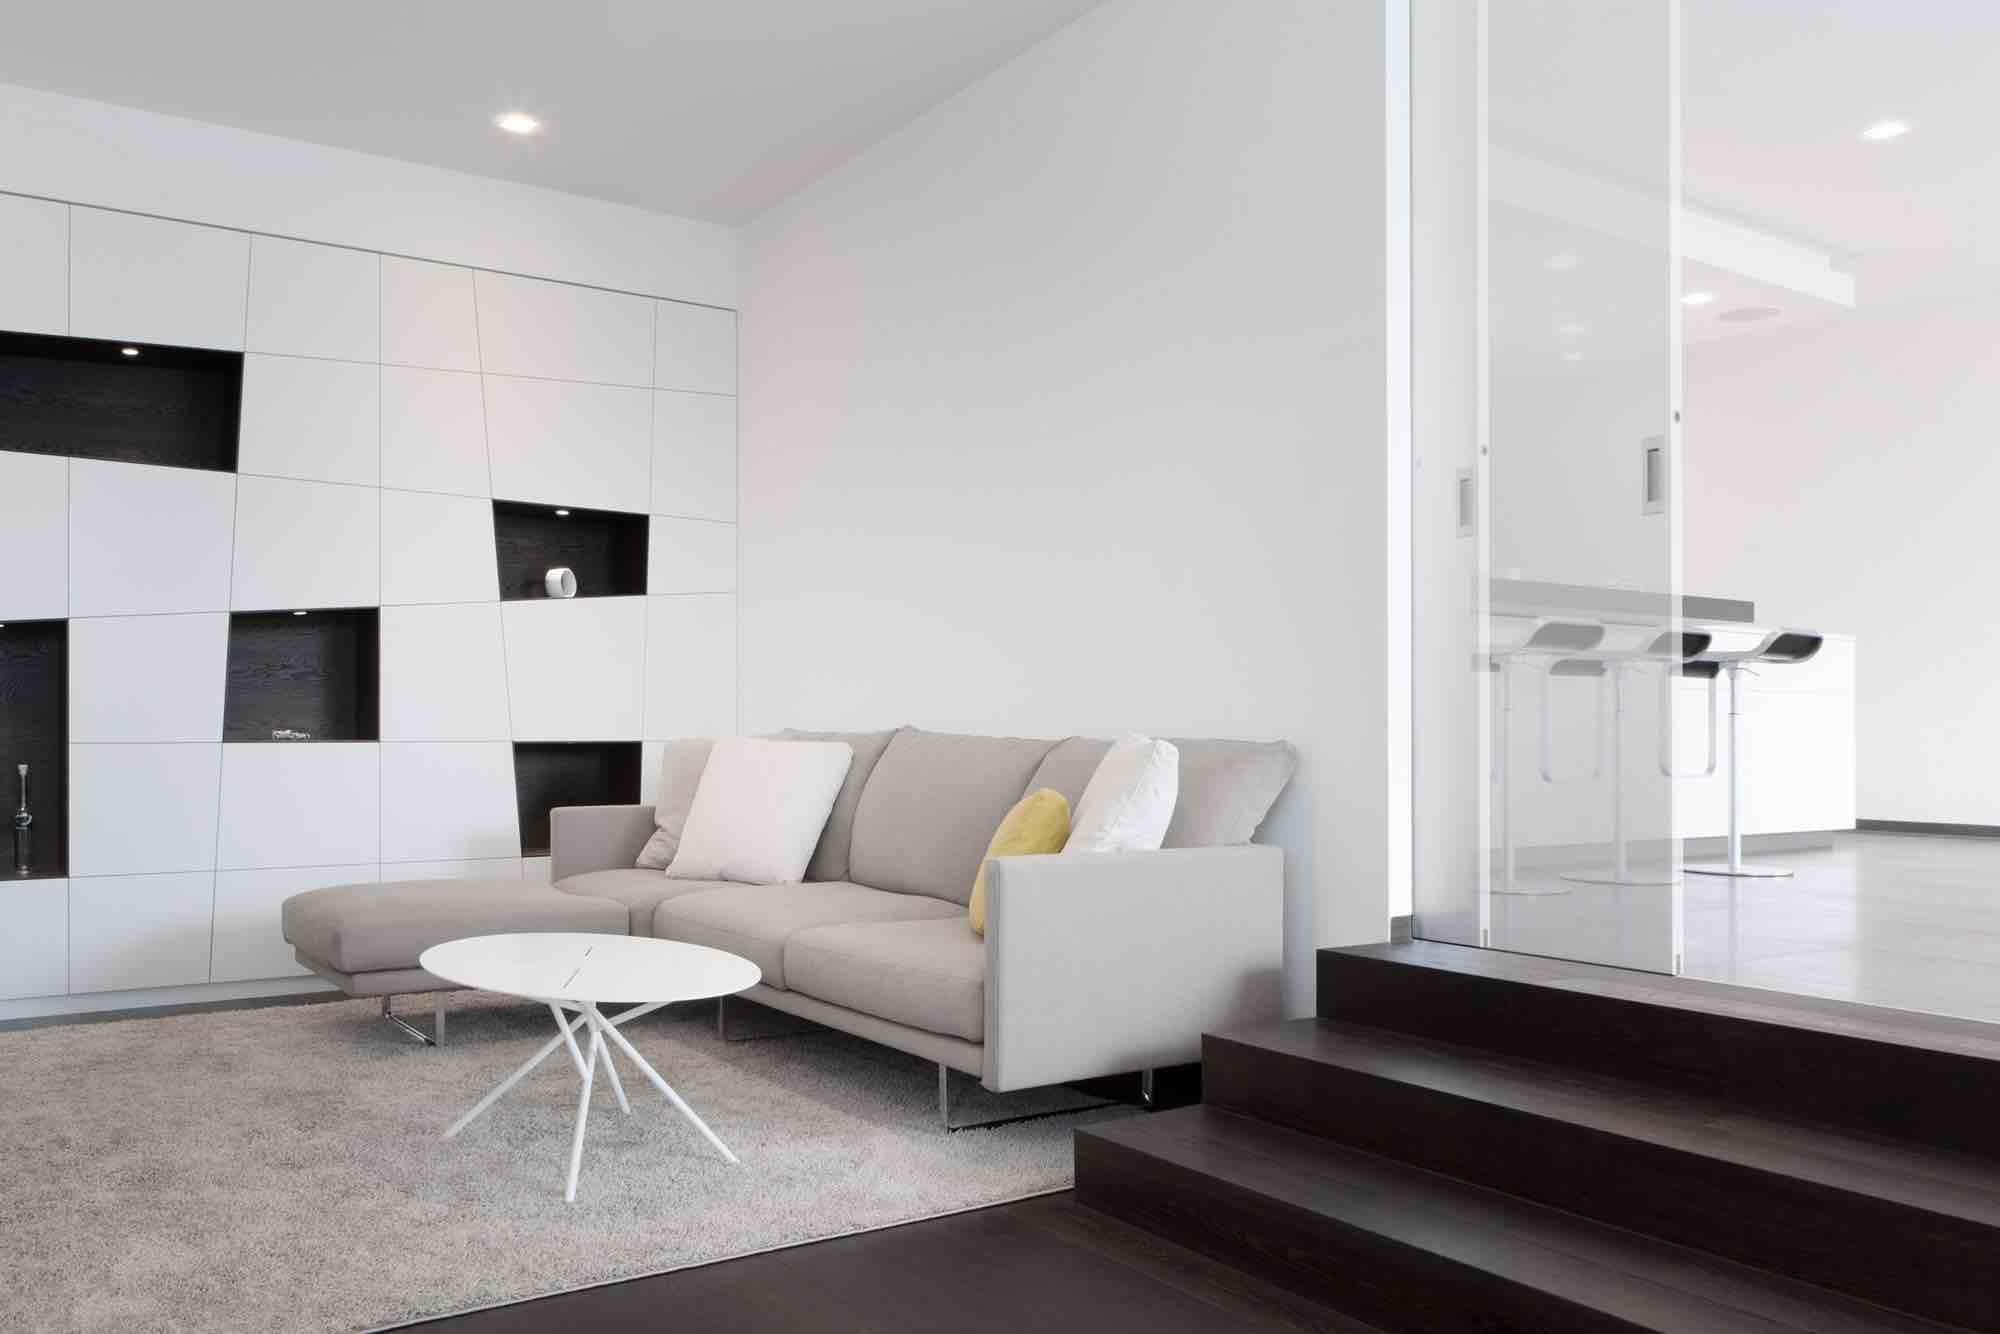 m2-house-monovolume-architecture-design_villa_moritzing_14